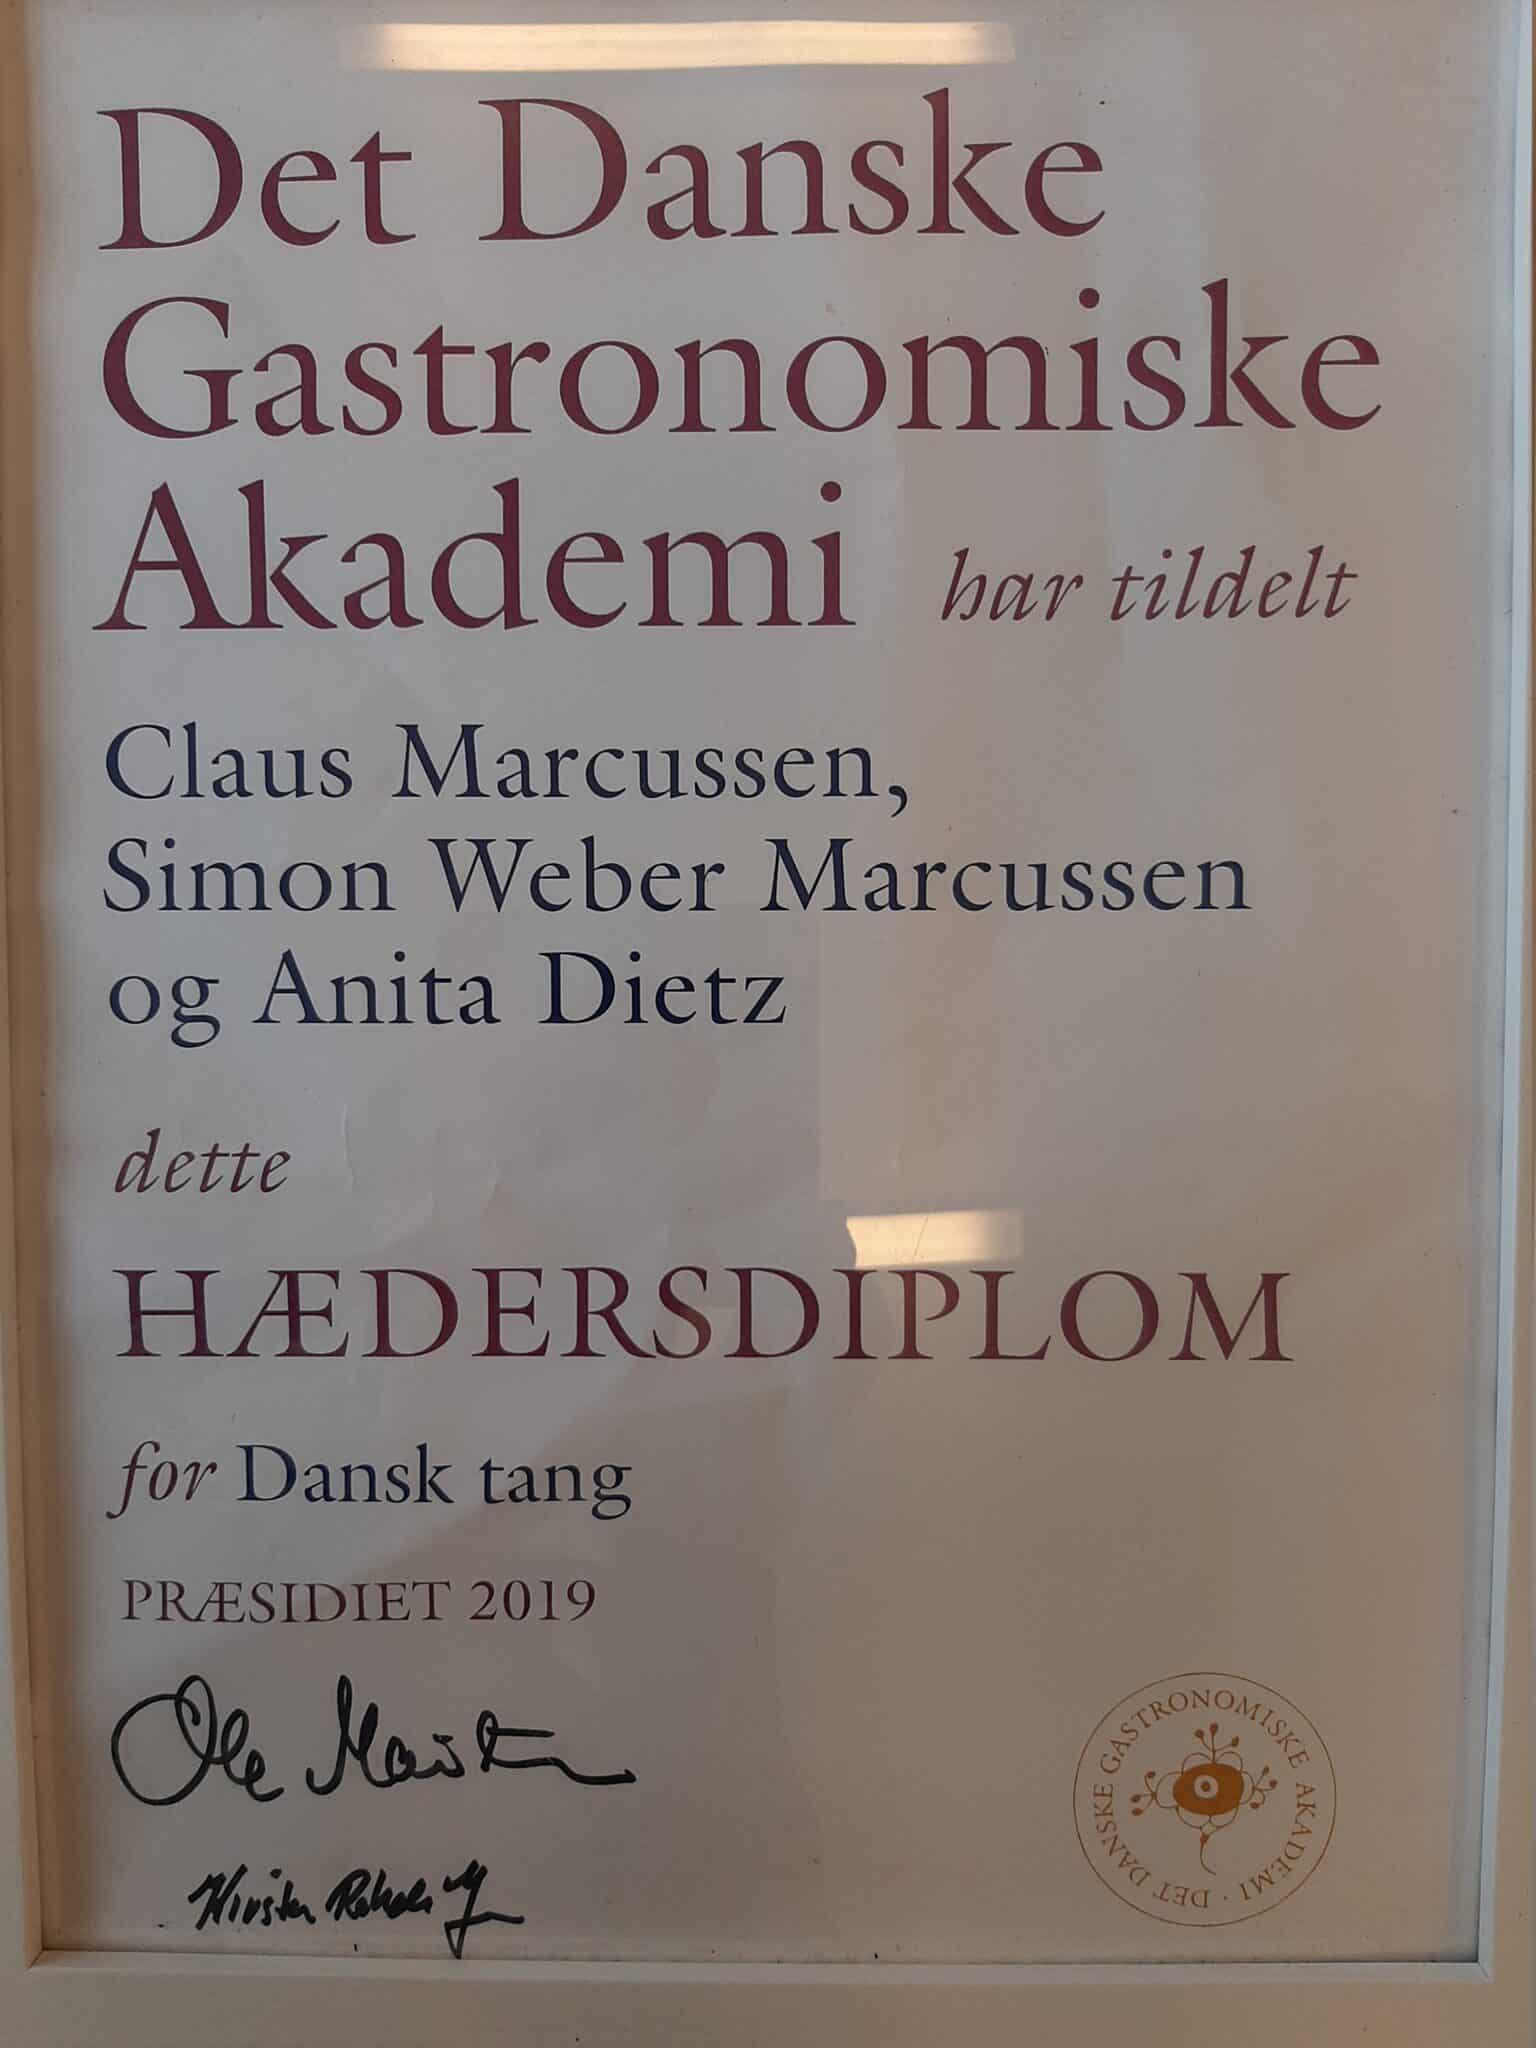 Dansk tang overrakt det danske gastronomiske hædersdiplom